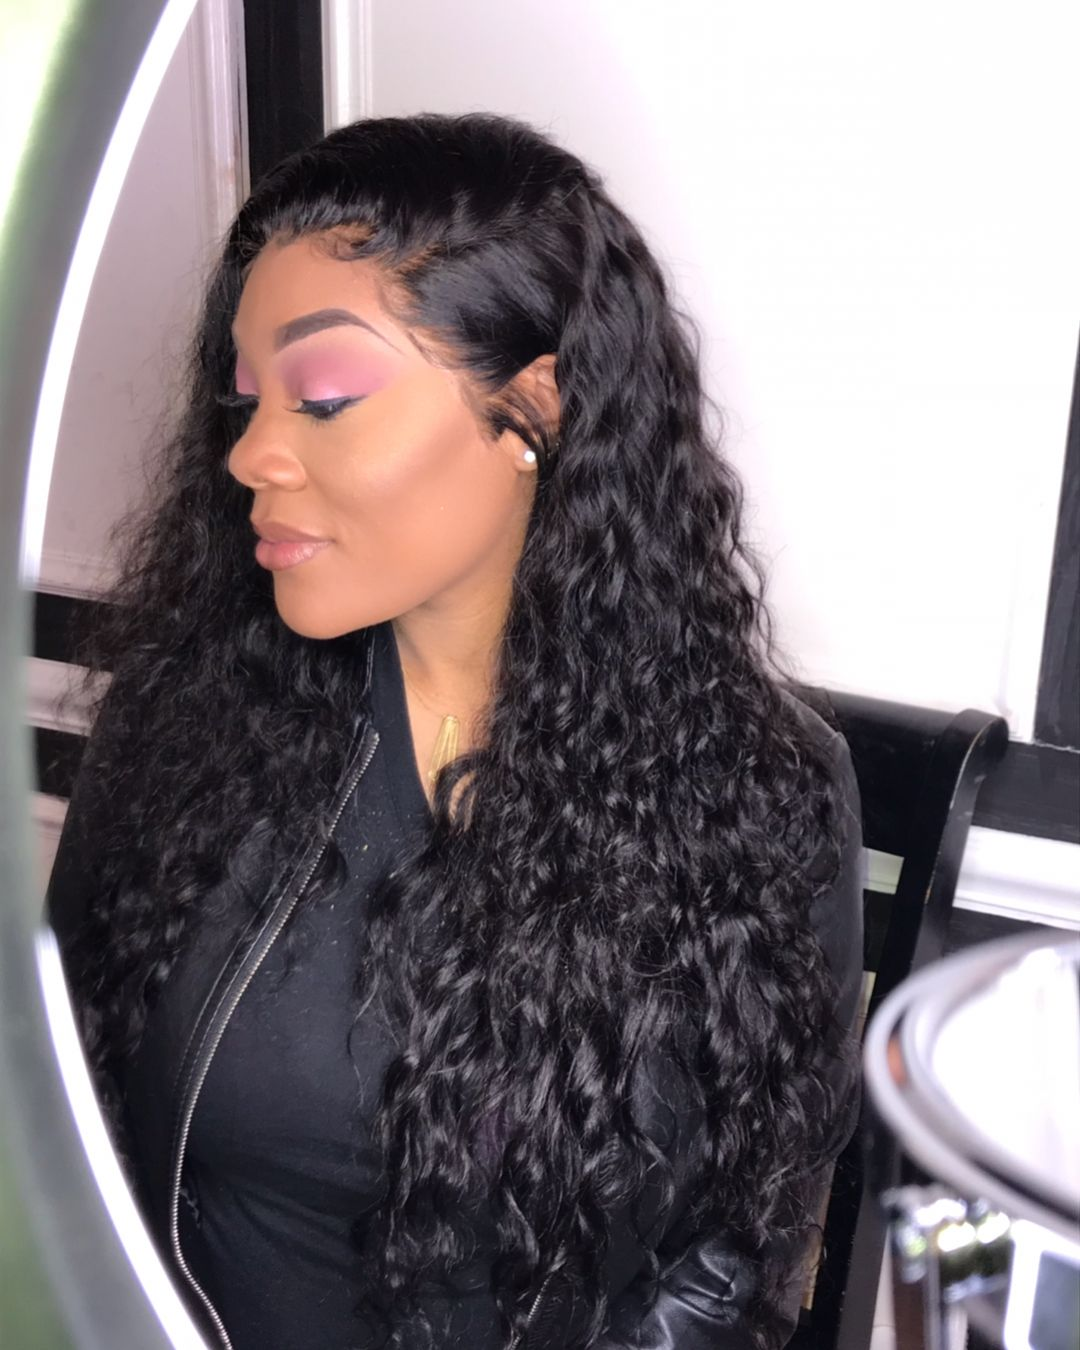 Yolissa Brazilian Loose Deep Wave Bundles With Closure 2 3 4 Pcs Human Hair Weave Bundles With Closure 4x4 Rem Weave Hairstyles Deep Wave Hairstyles Human Hair